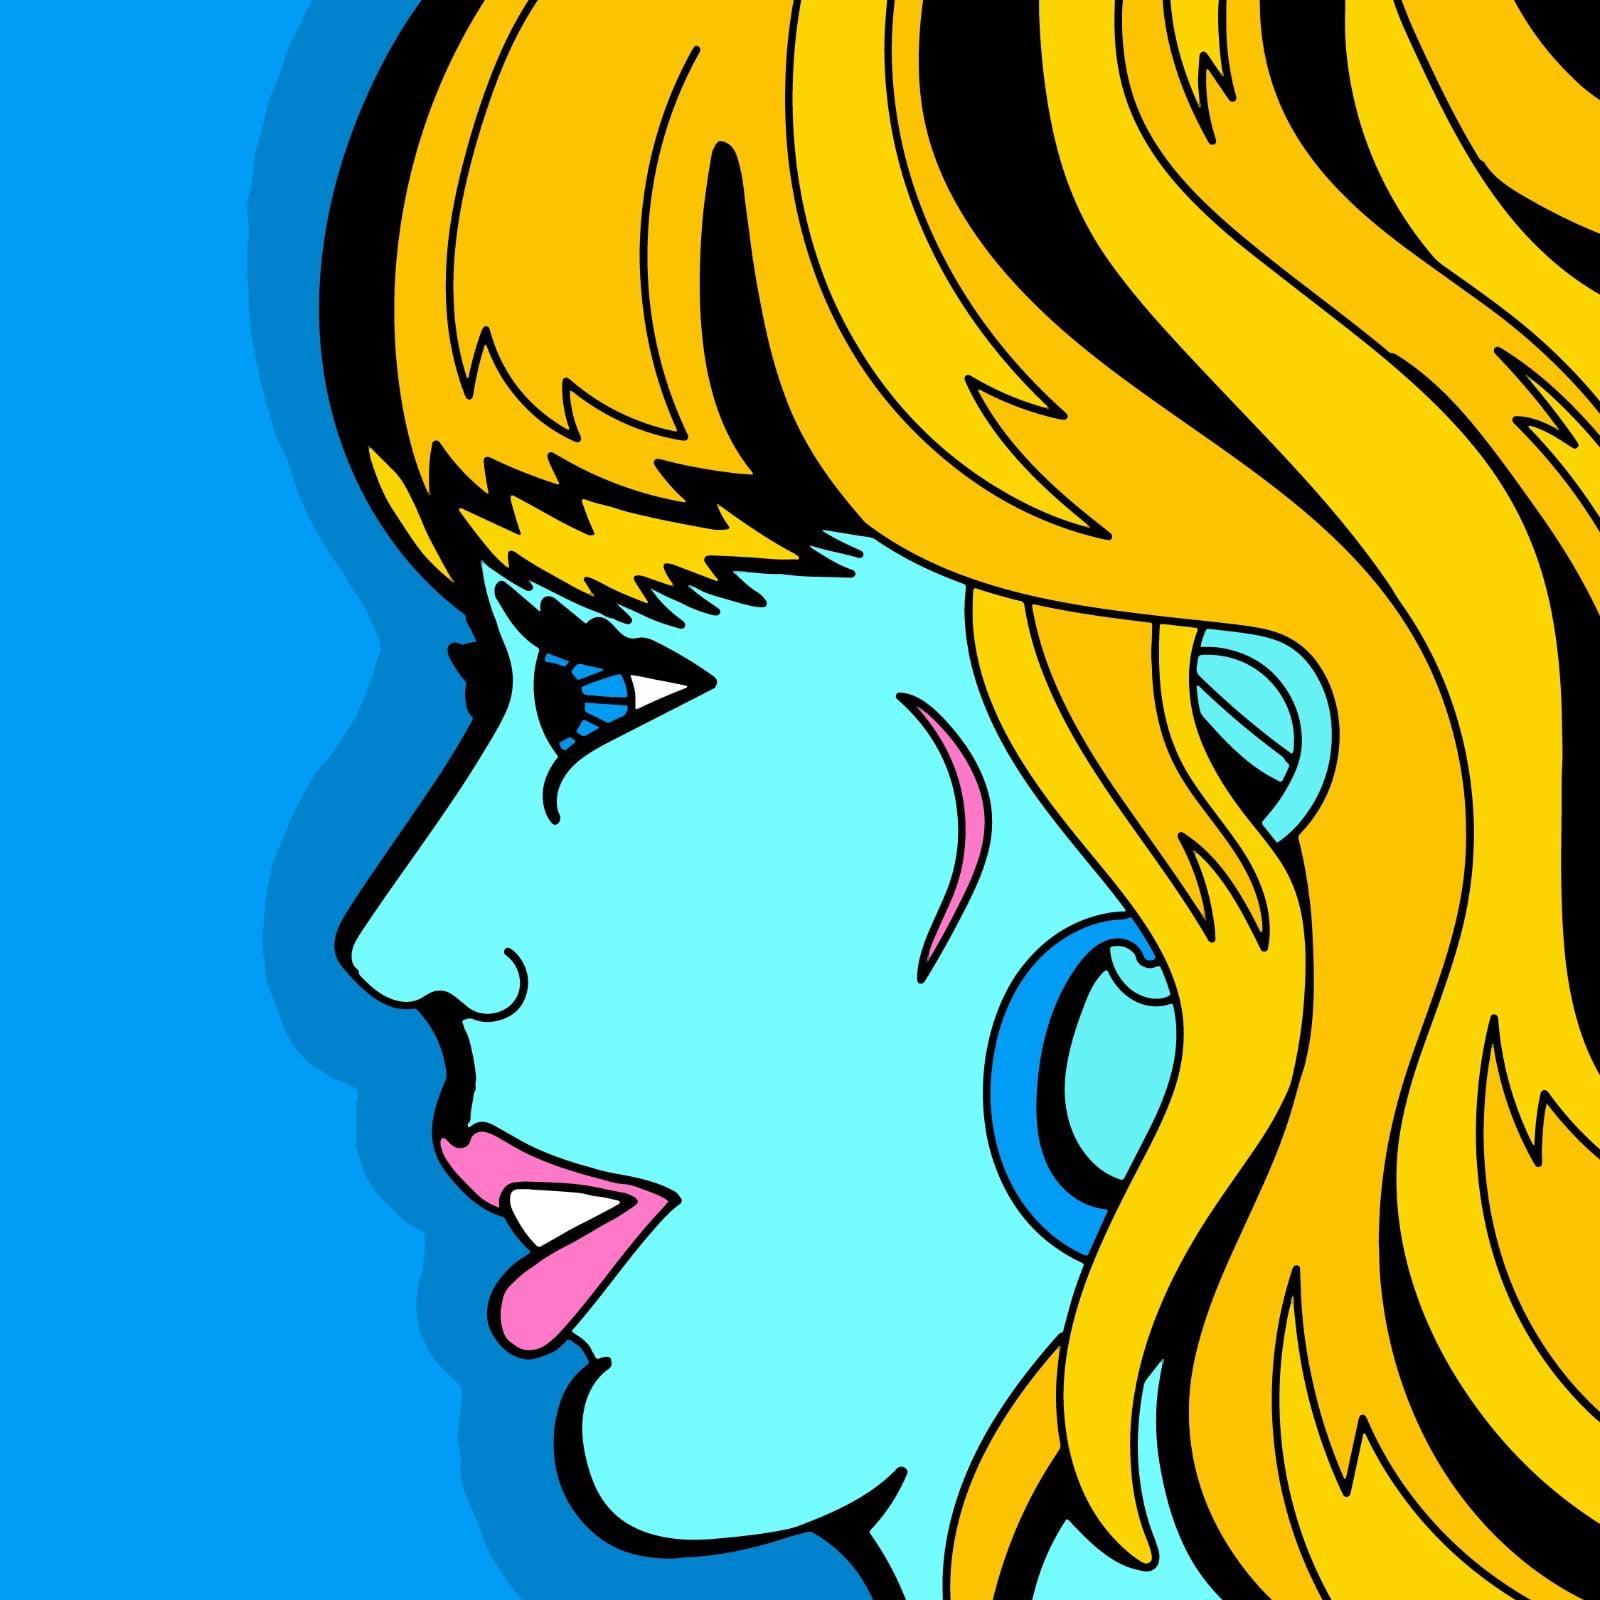 Taylor Swift illustration done by Mina Tocalini of 360 MAGAZINE.